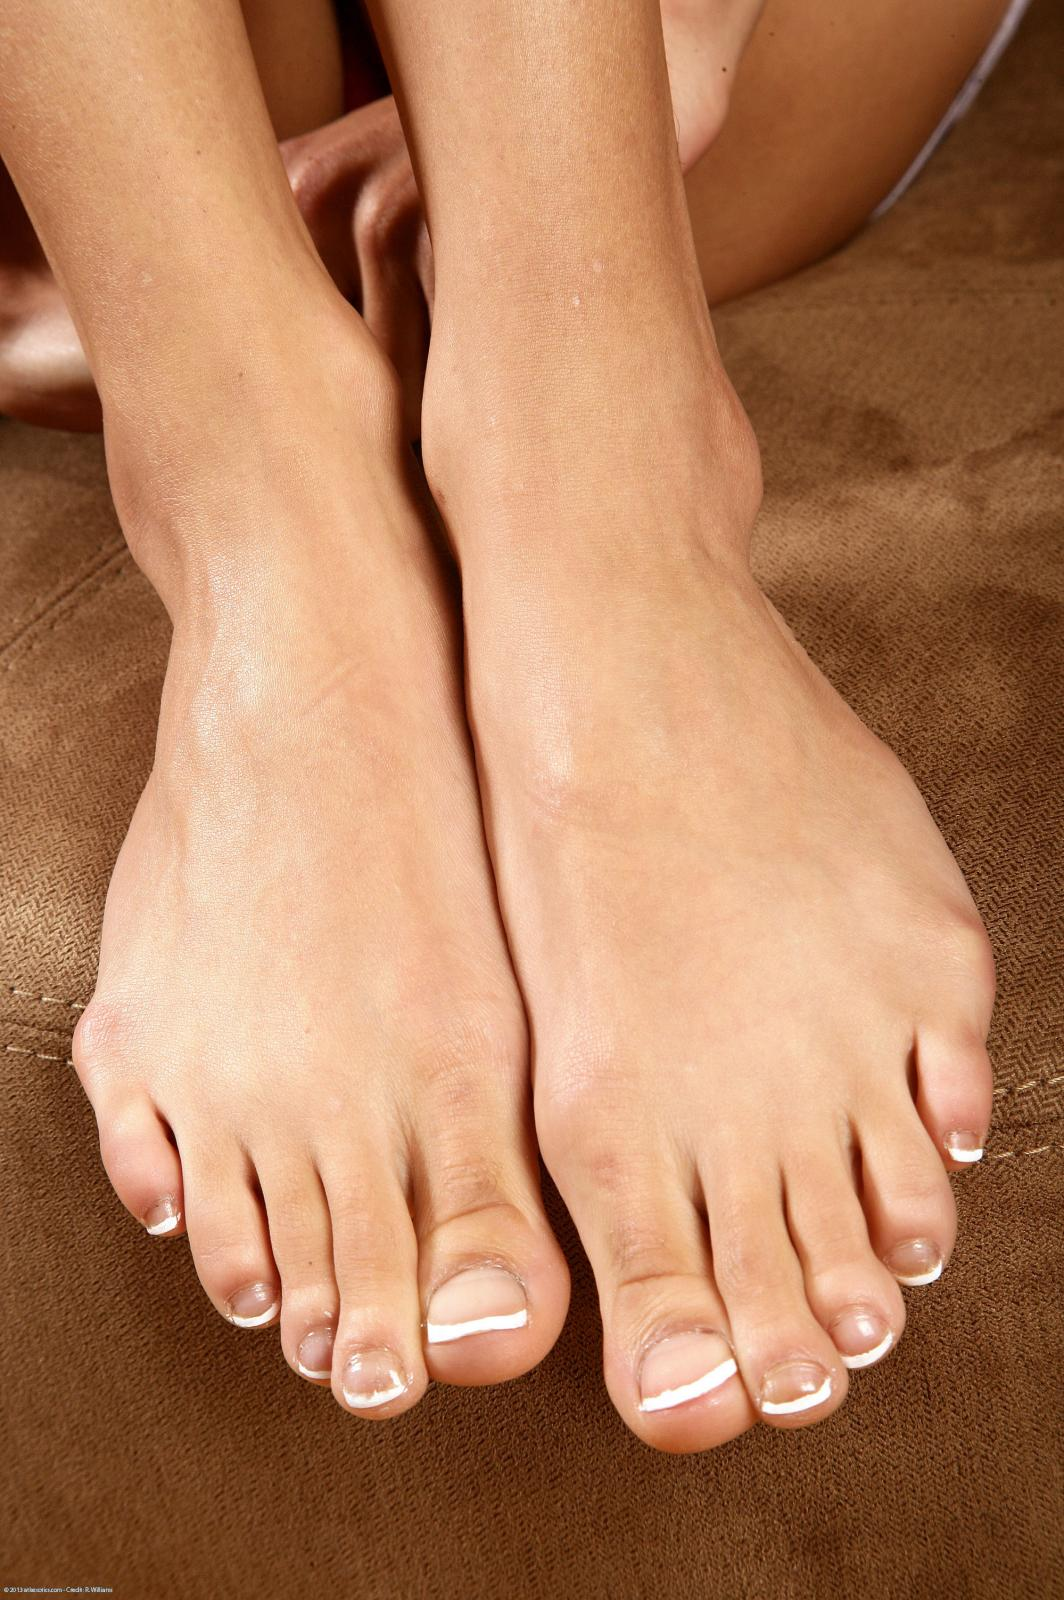 a girl named Aileena showing her feet